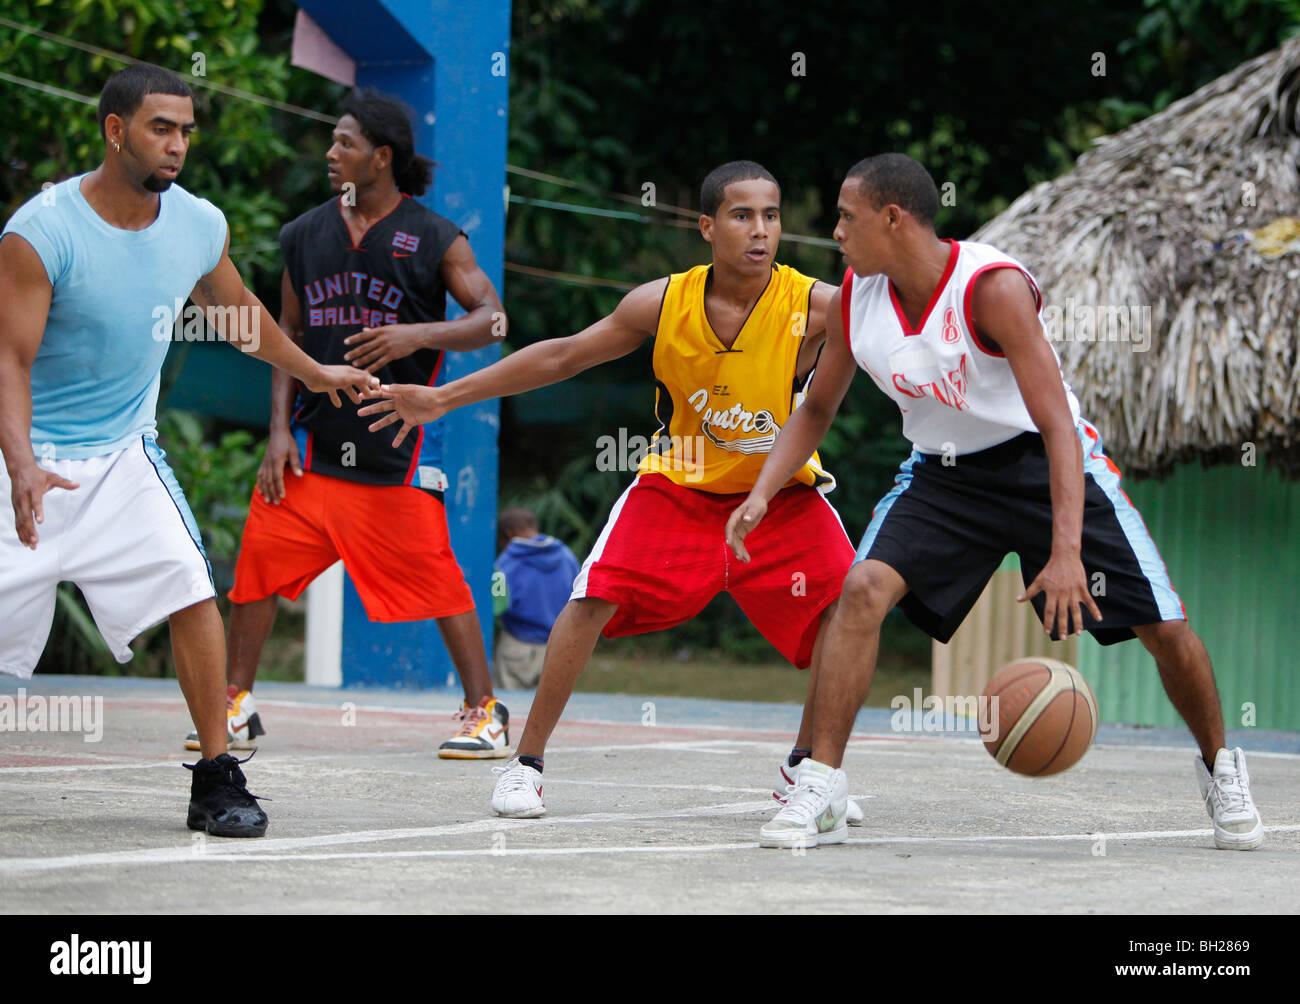 Juego de baloncesto de barrio, Bahoruco, República Dominicana Imagen De Stock